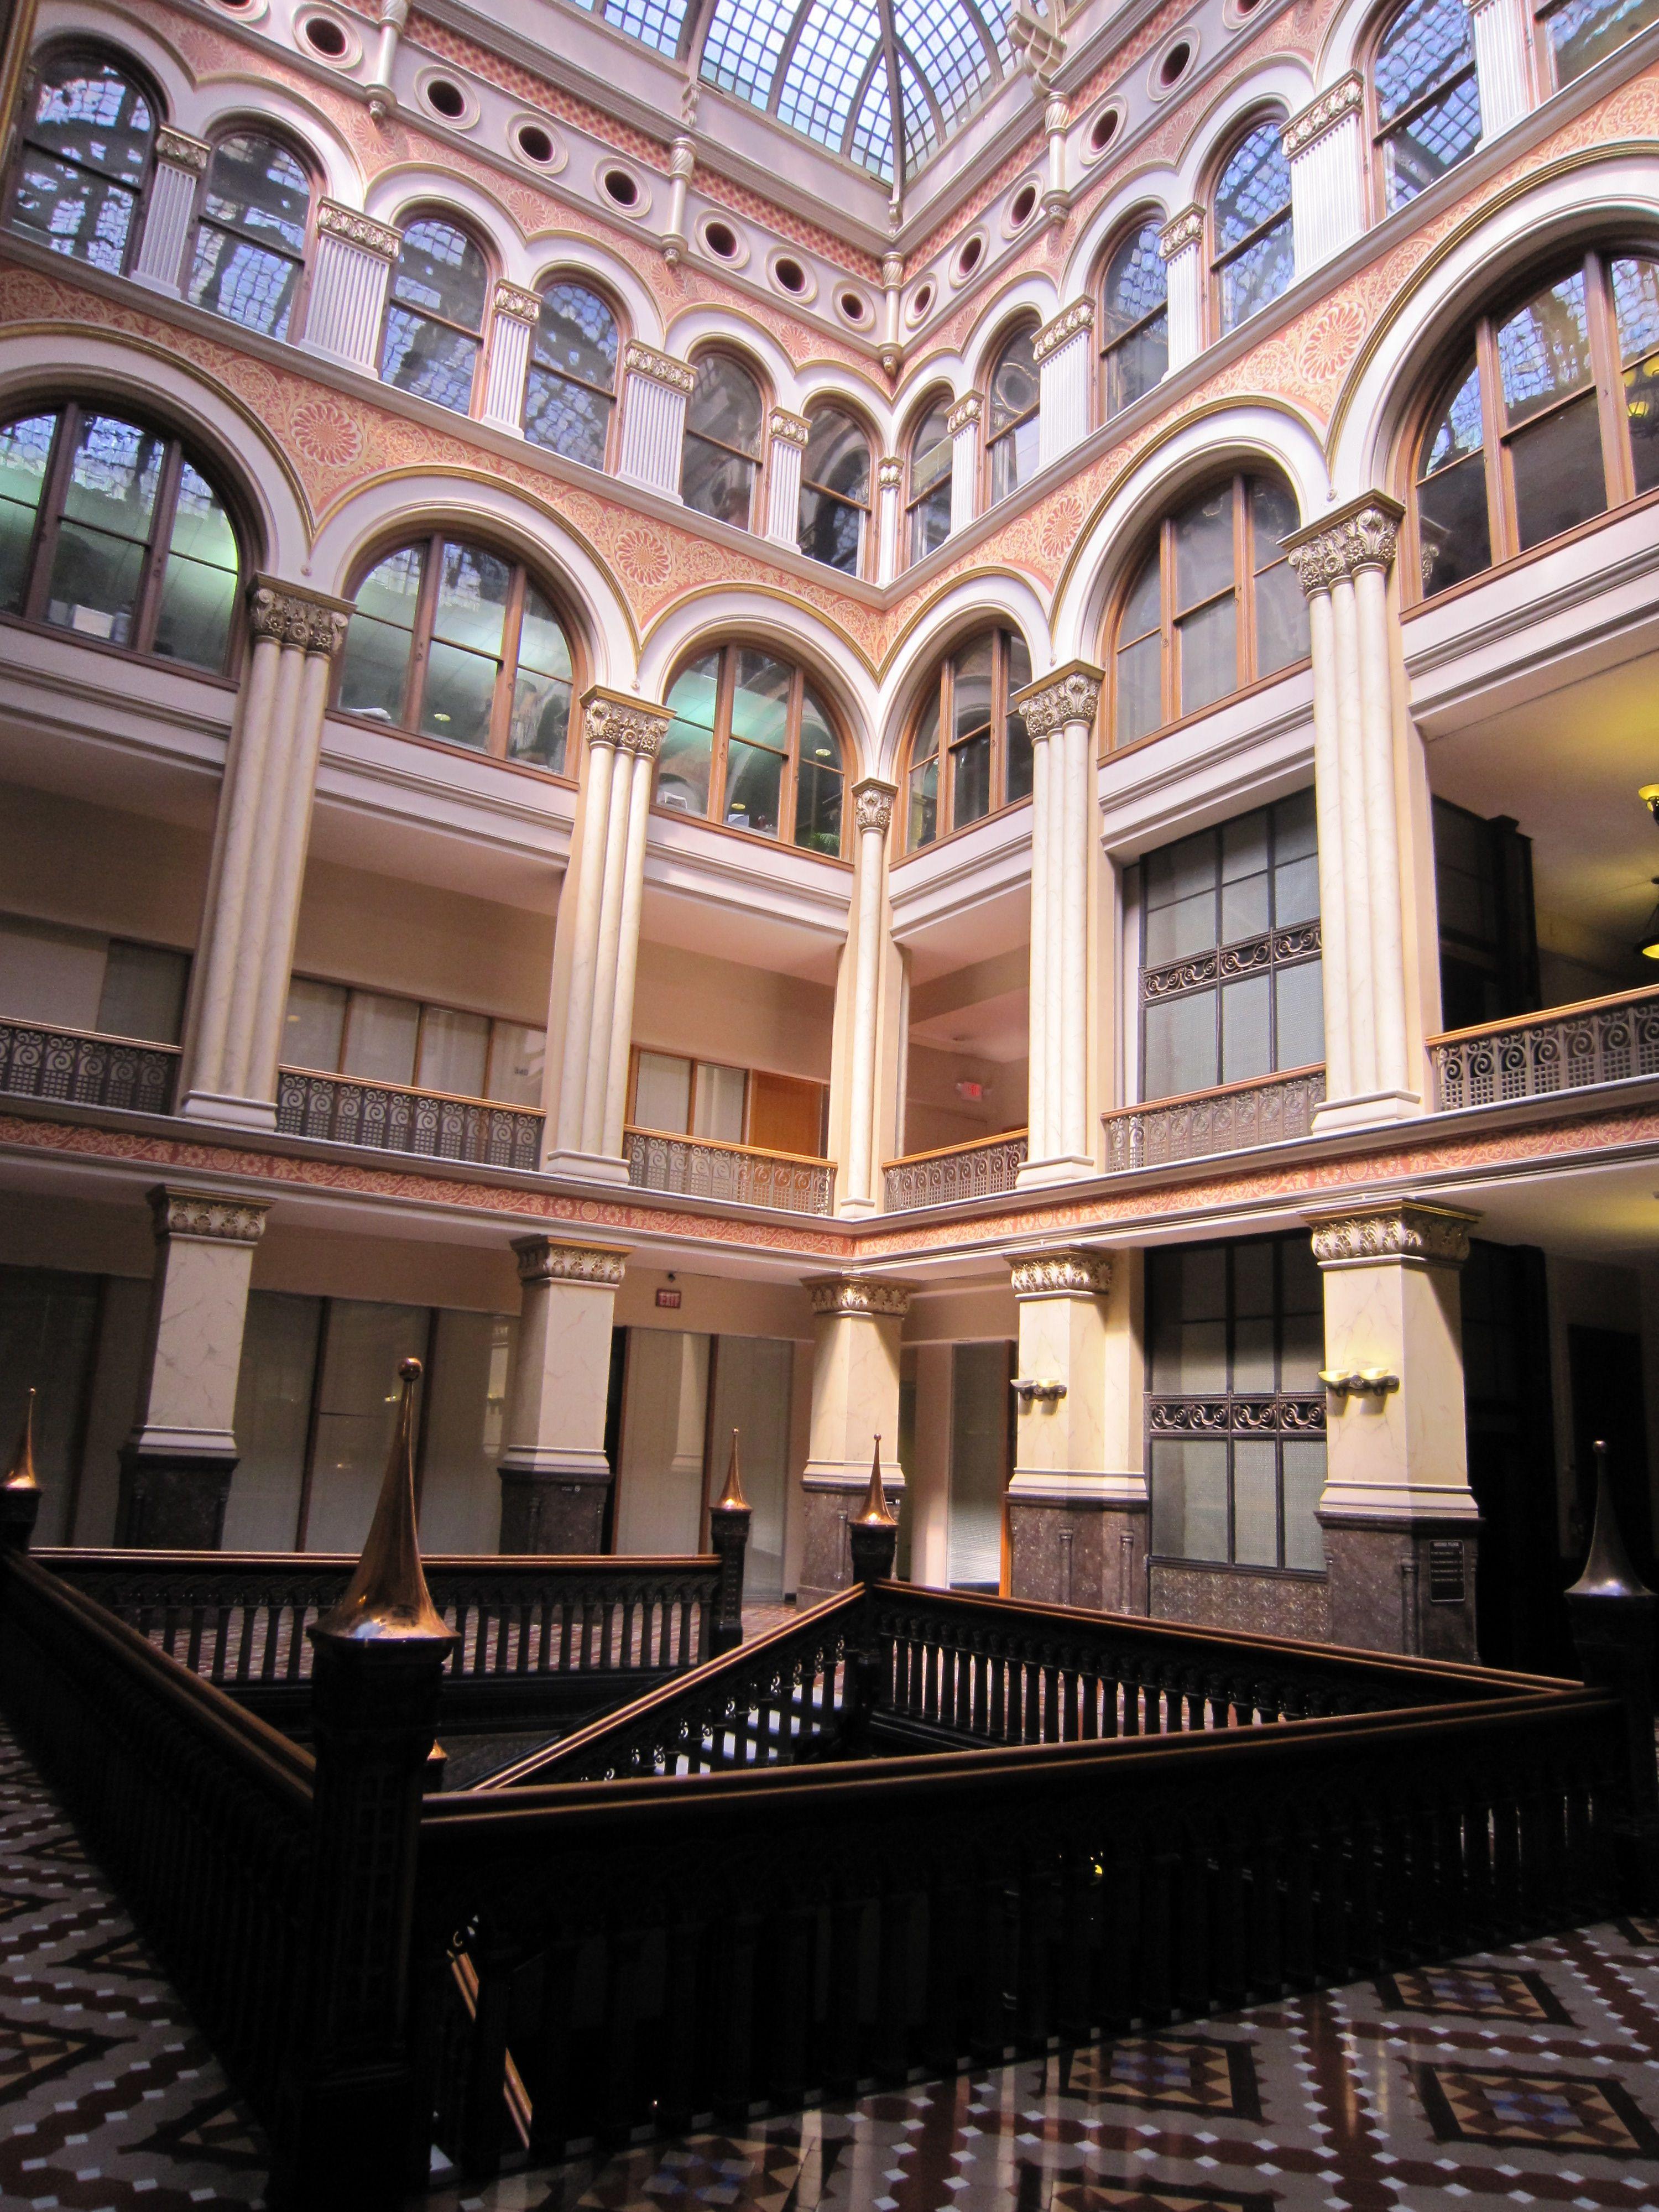 The Hilton Garden Inn Milwaukee Downtown is located within